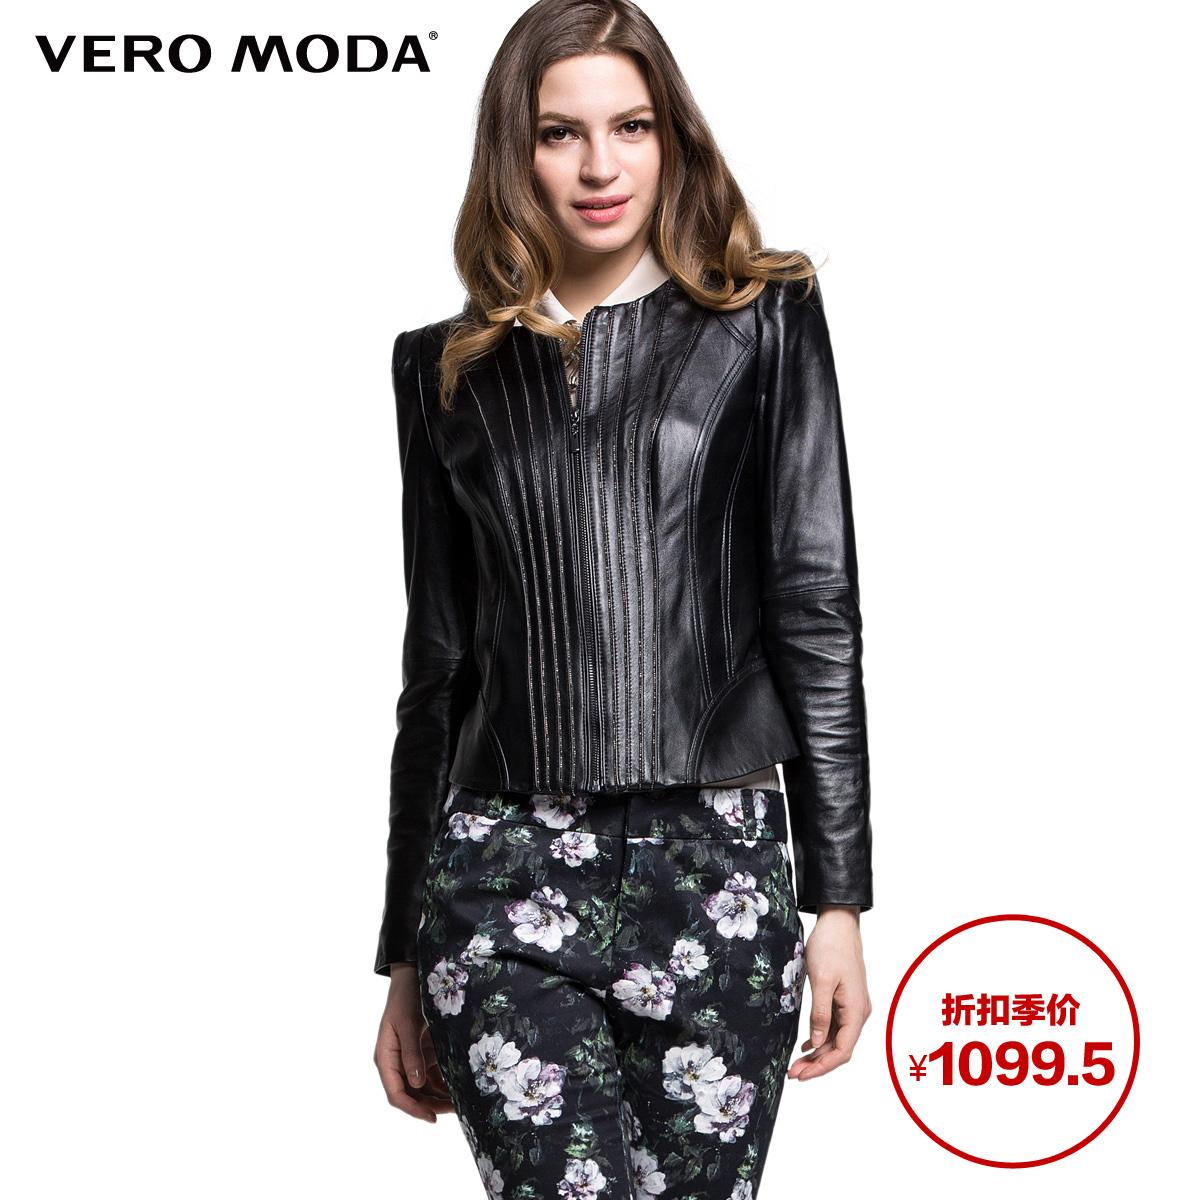 Кожаная куртка VERO MODA 315110002 1099.5 daybreak hardlex uhren 2015 damske hodinky orologi di moda relojes relogios db2161